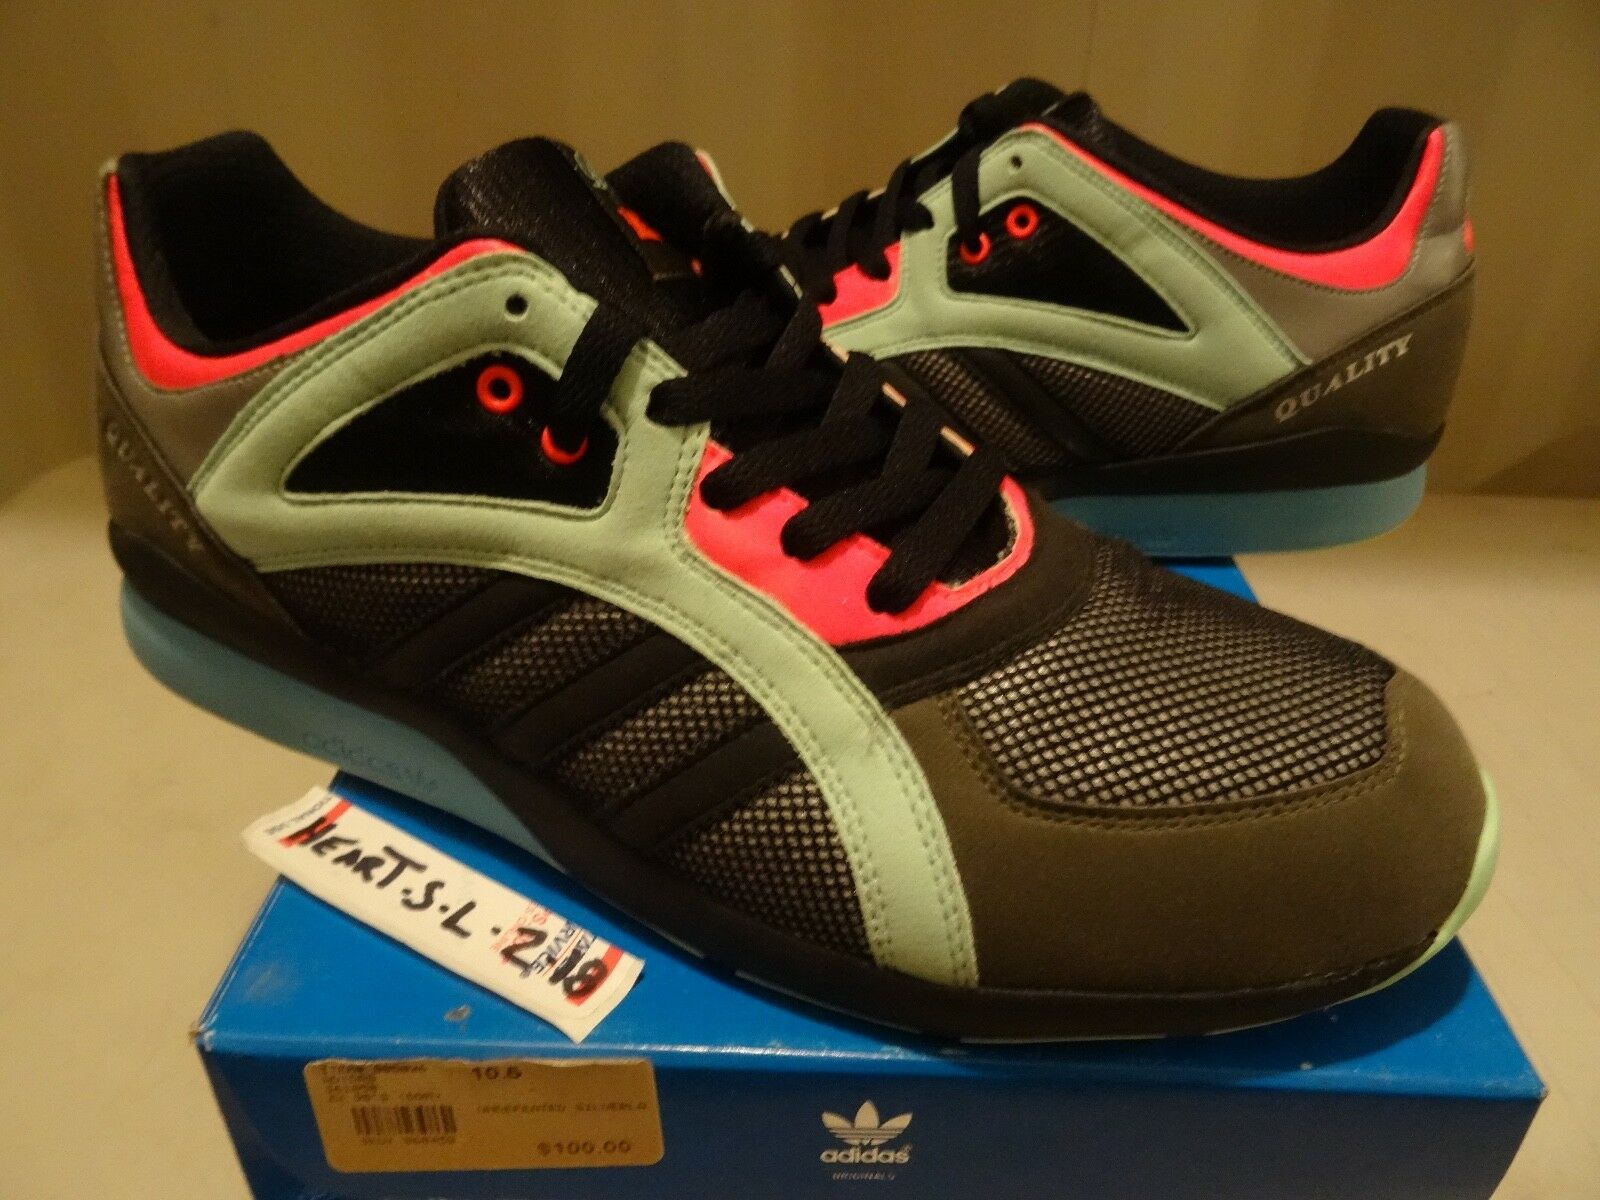 ADIDAS AZX CONSORTIUM ZX 90S RUN DQM 361058 SIZE 10.5 FOOTPATROL JUICE UNDFTD